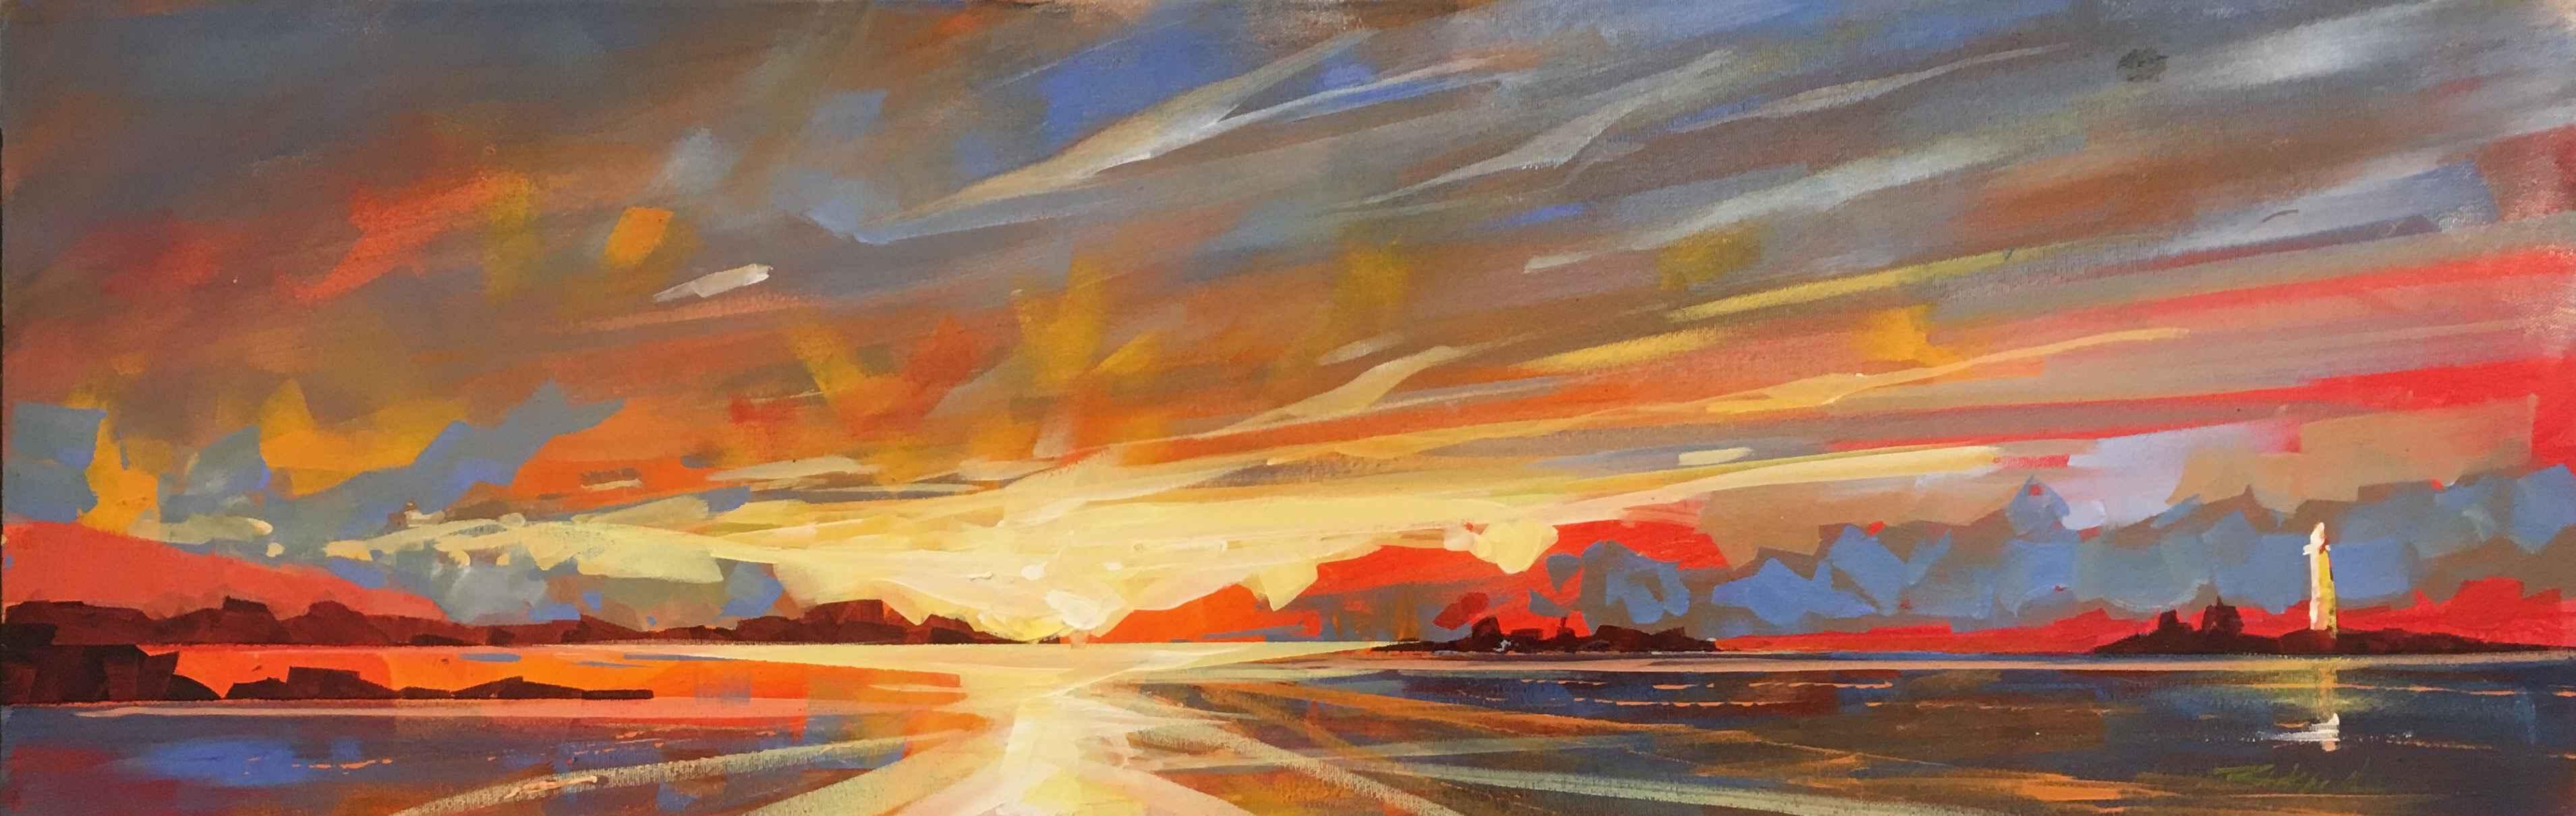 Lighthouse Sunset by  Brian Buckrell - Masterpiece Online